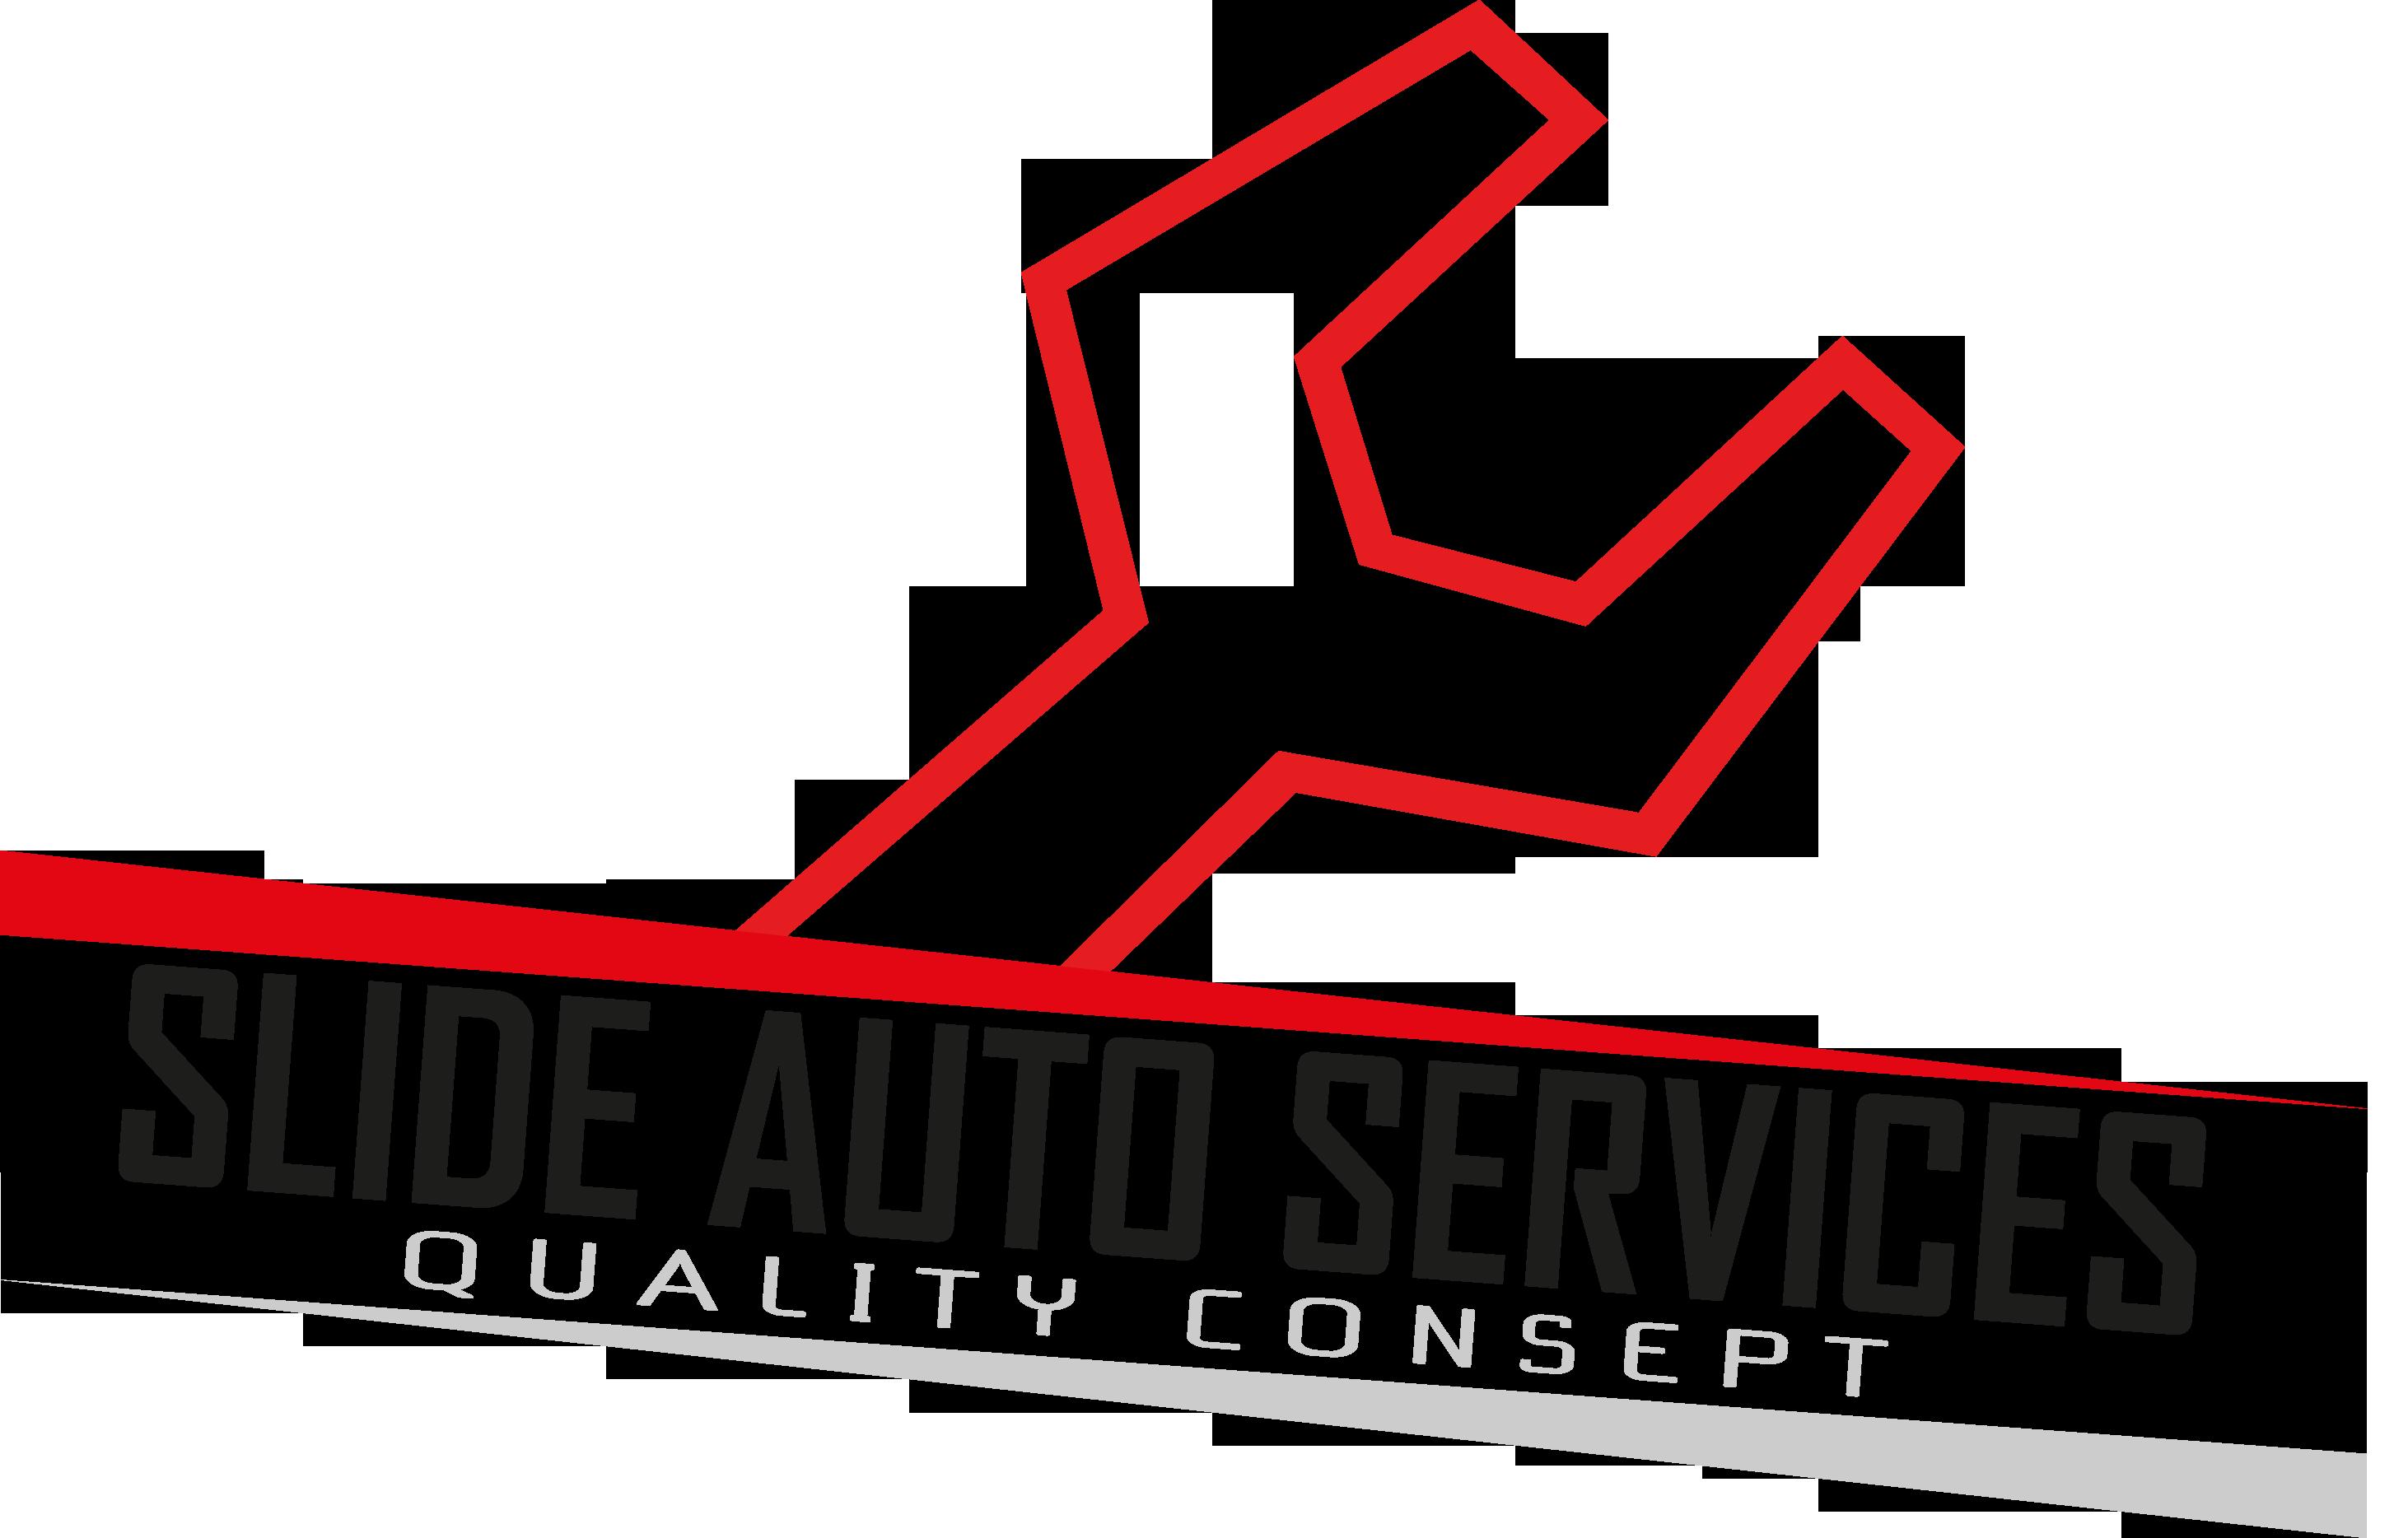 https://www.mncjobsgulf.com/company/slide-auto-services